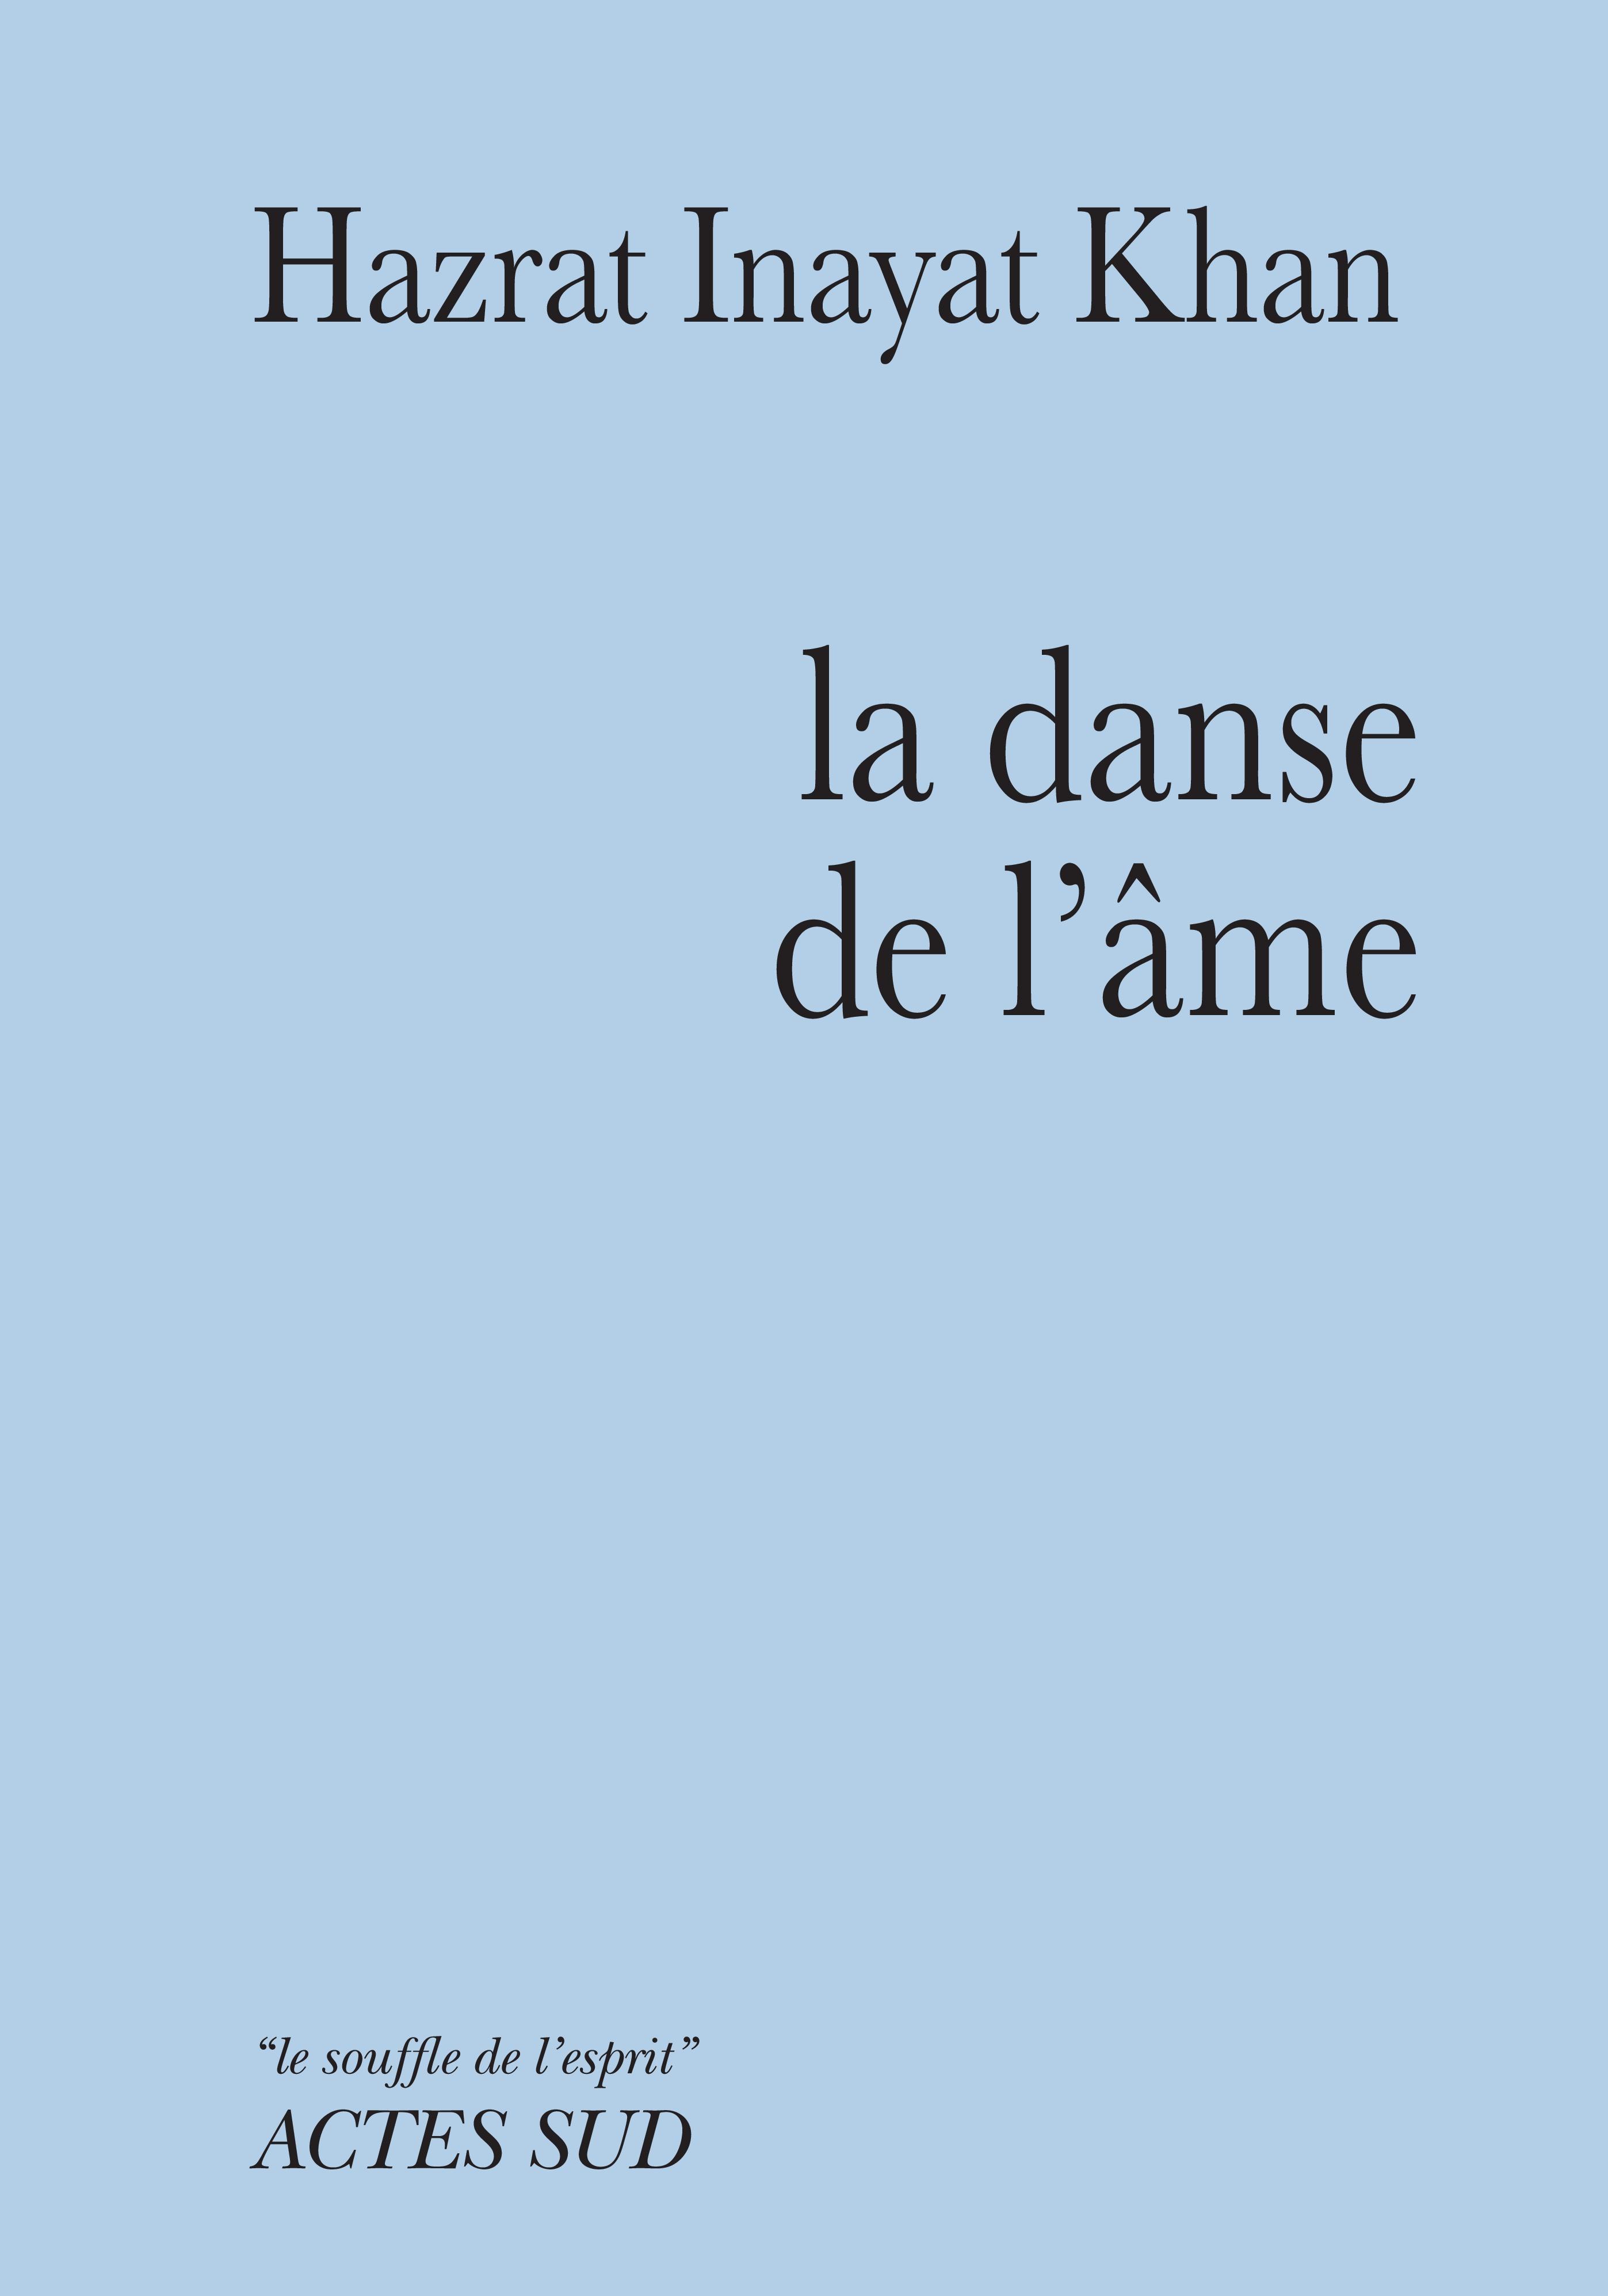 La Danse de l'âme